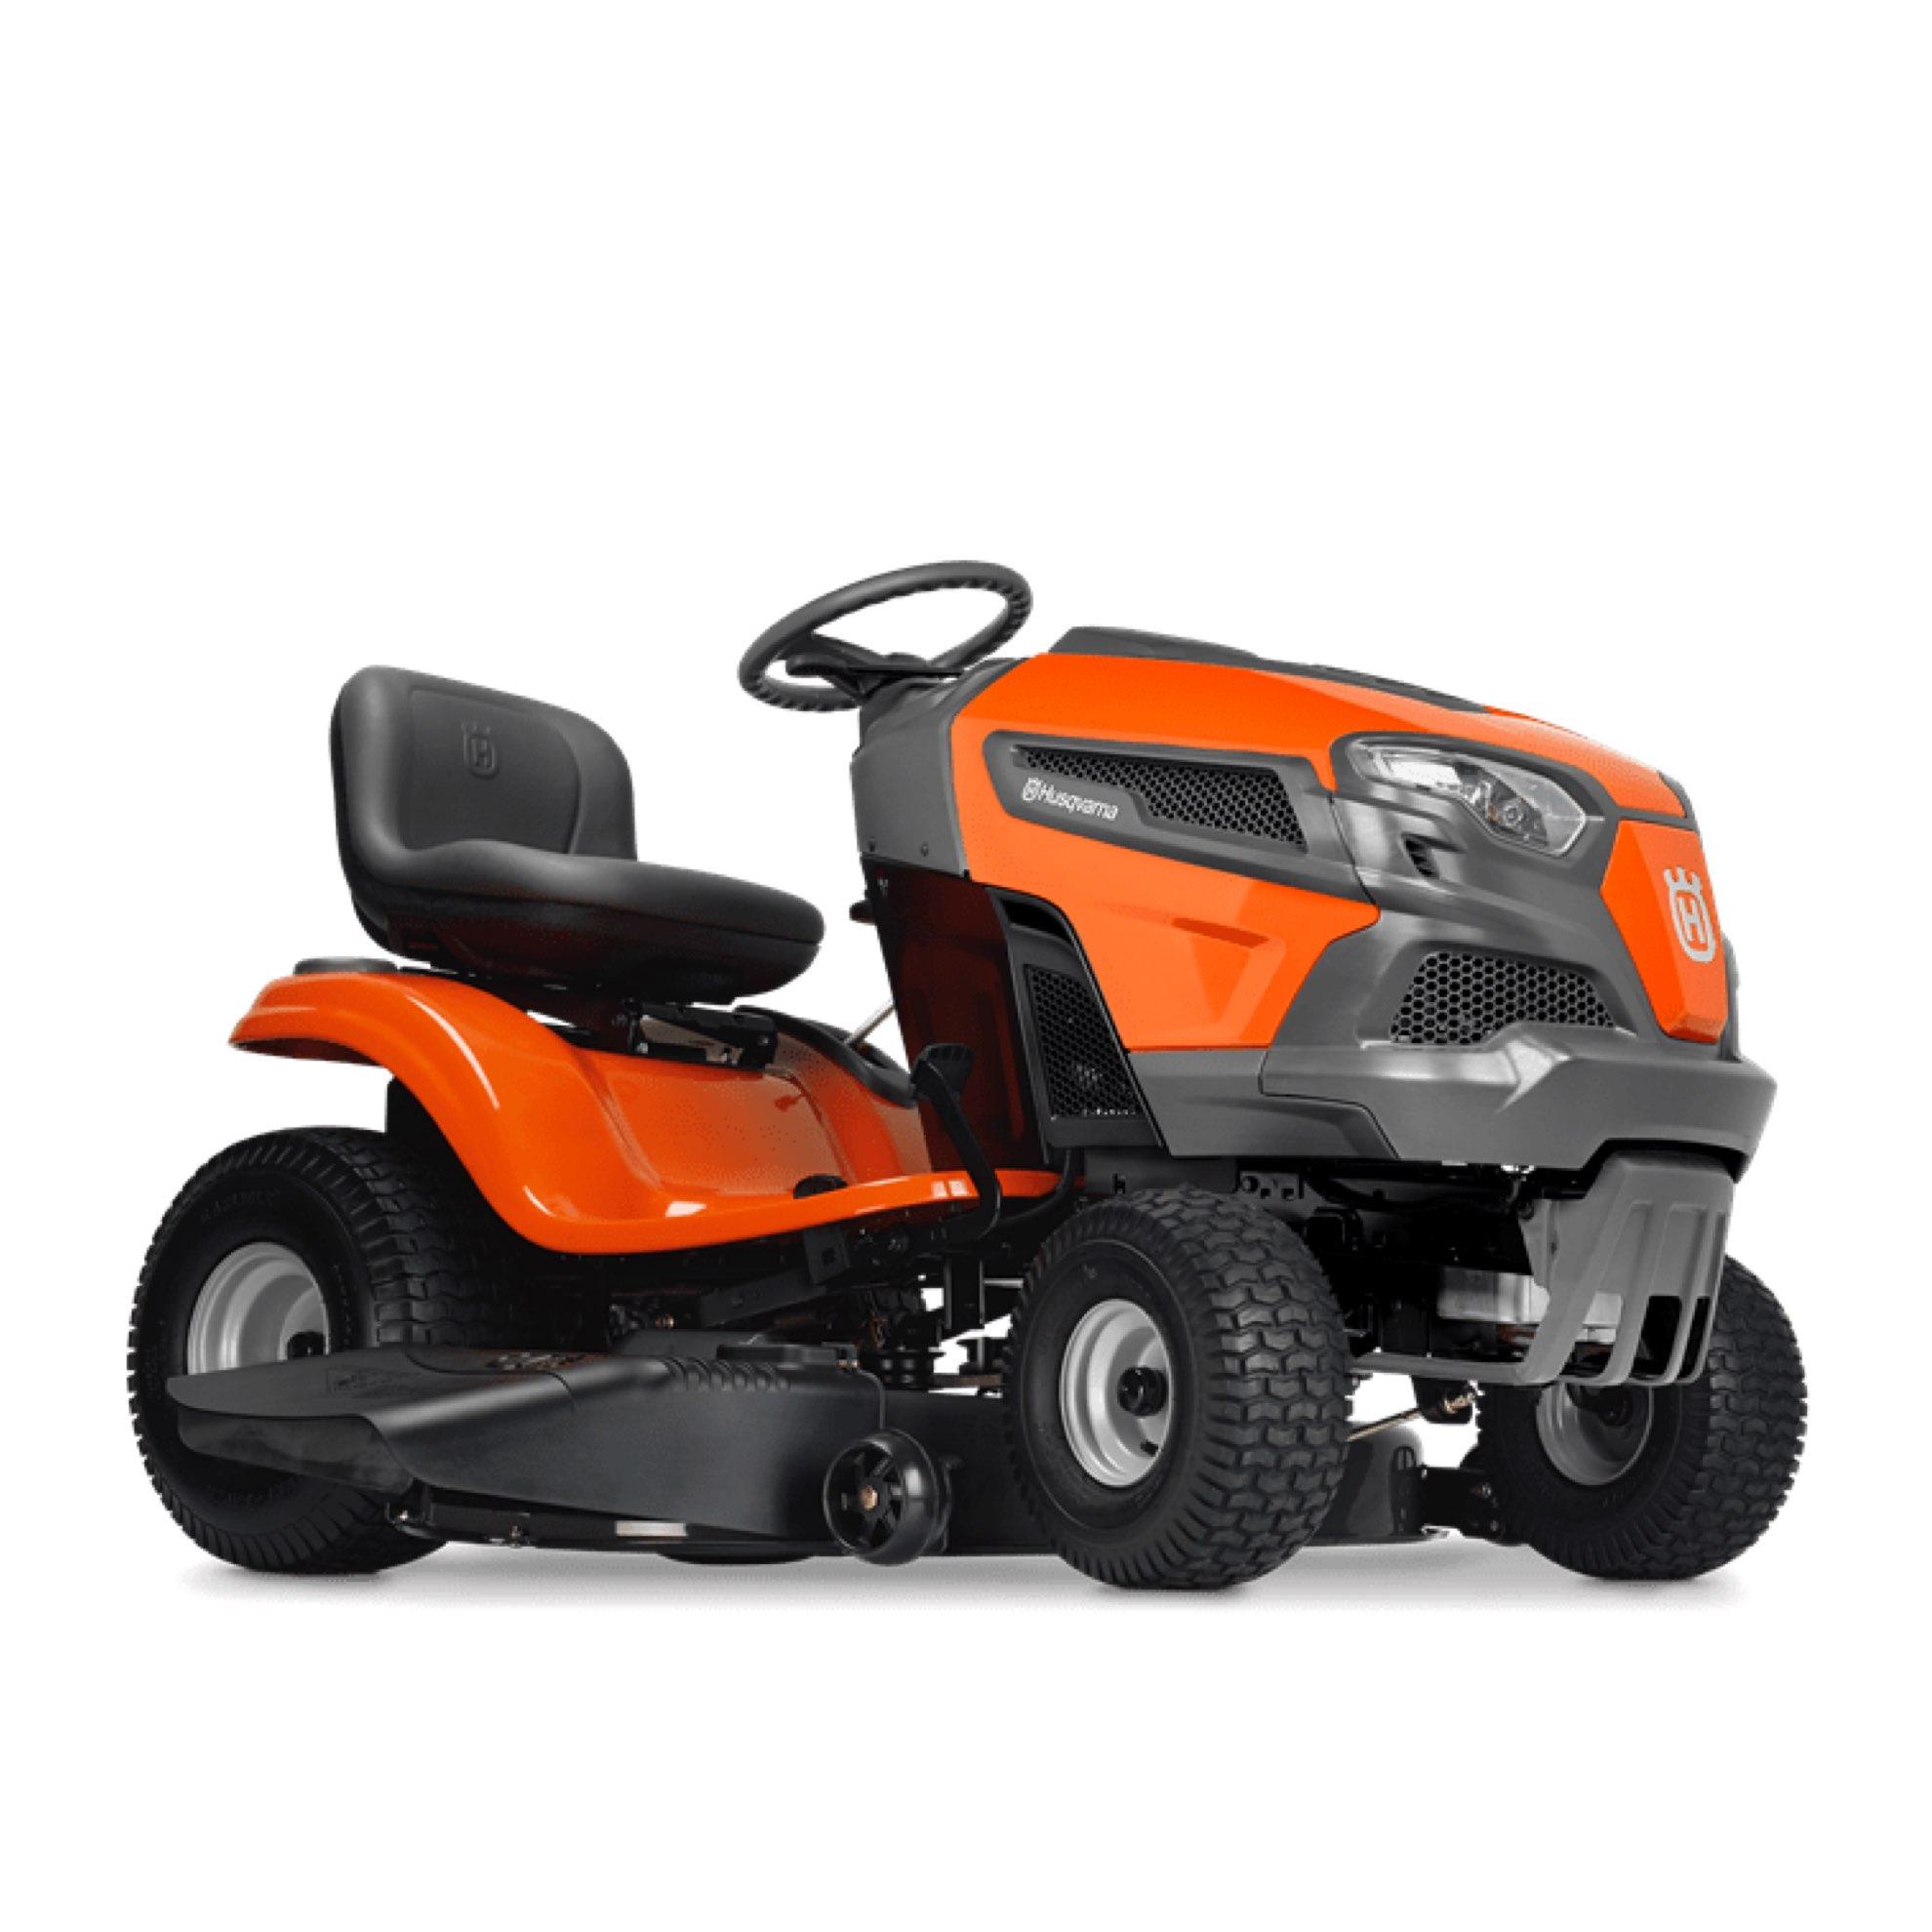 Husqvarna TS 142T Petrol-powered Garden Tractor